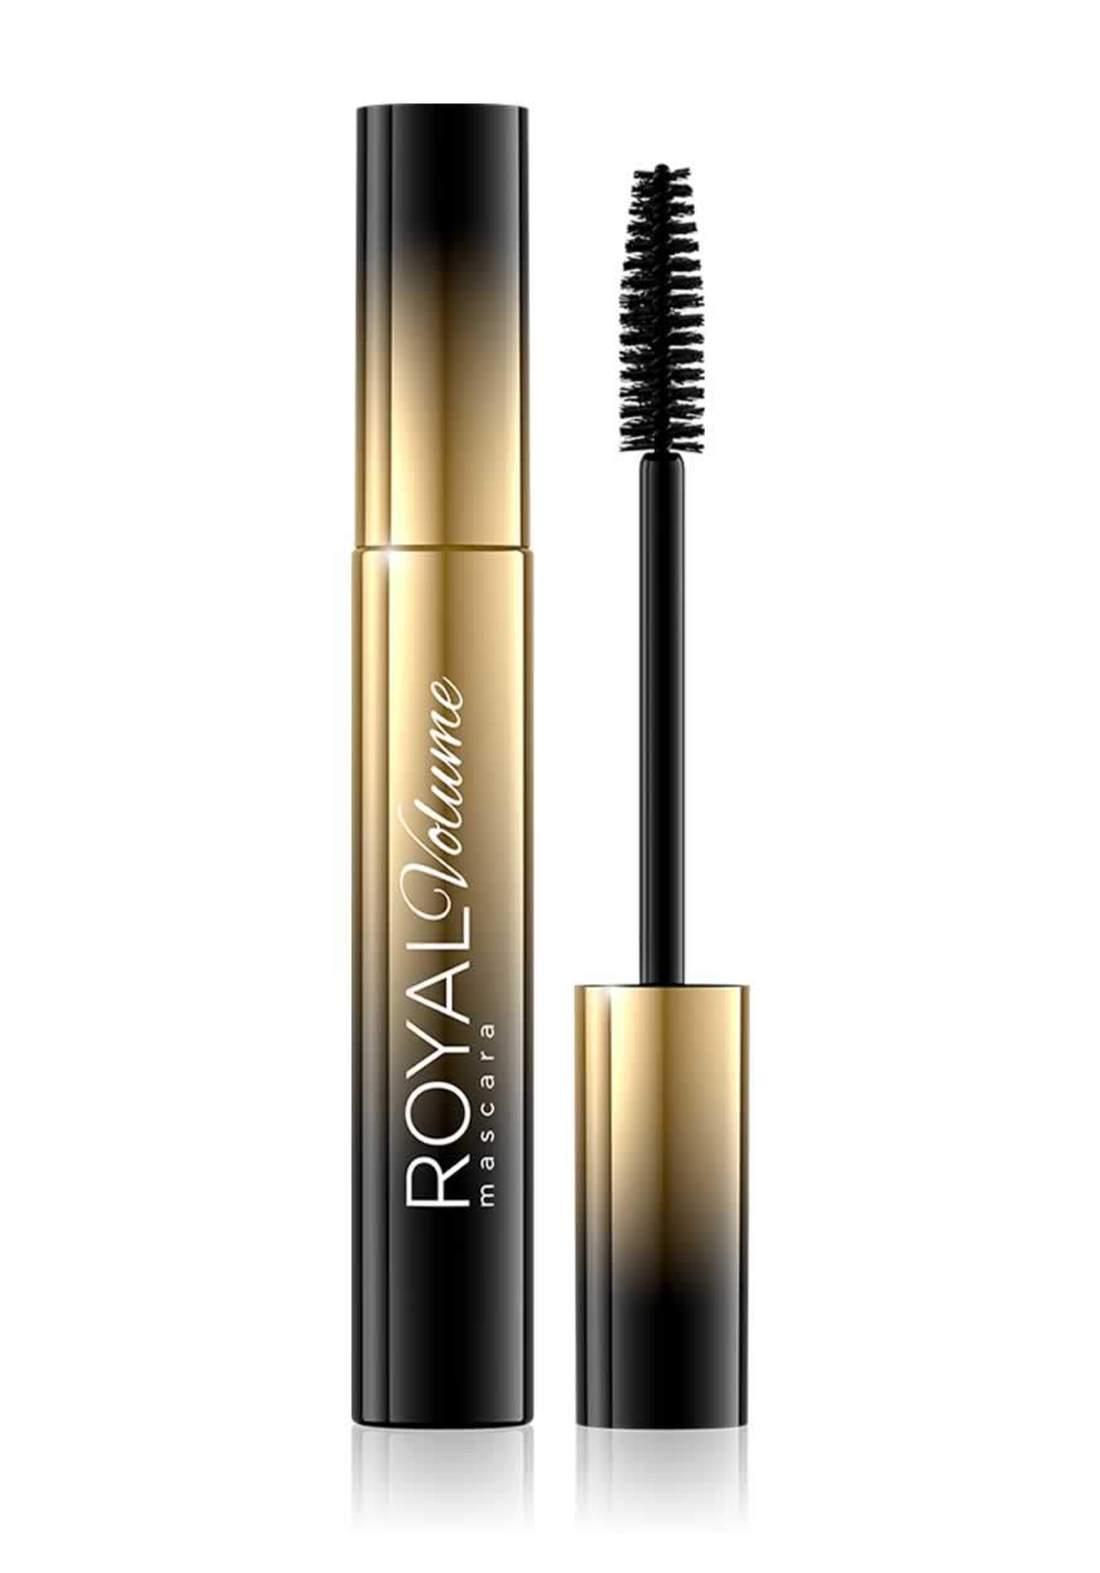 (095-0817)Eveline Cosmetics Mascara Royal Volume 10ml مسكارا